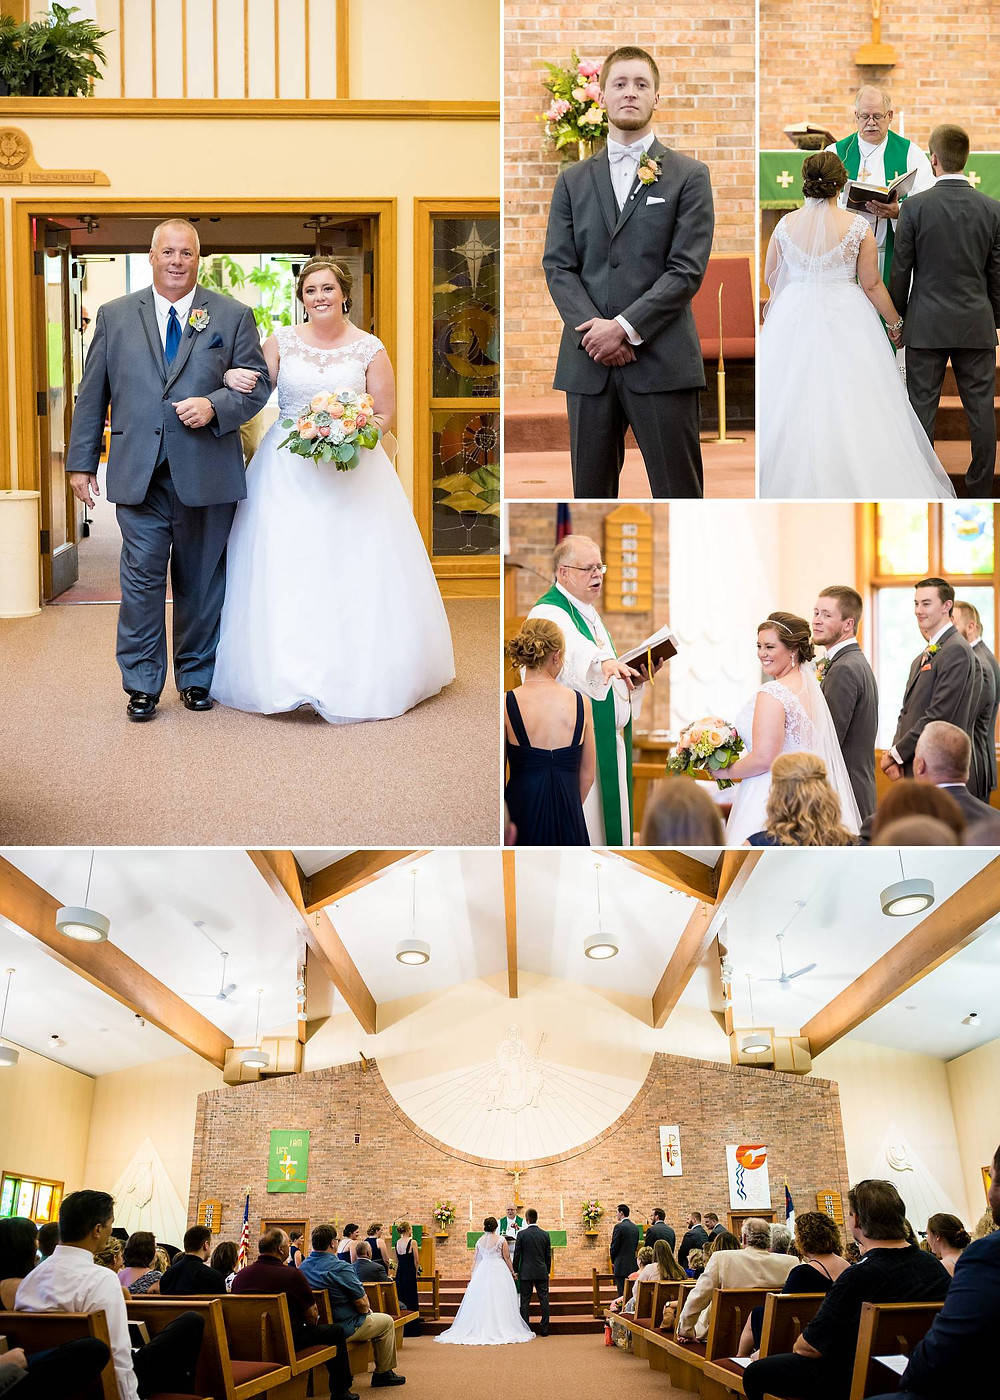 Oshkosh Wisconsin Summer Wedding Ceremony | Lanari Photography